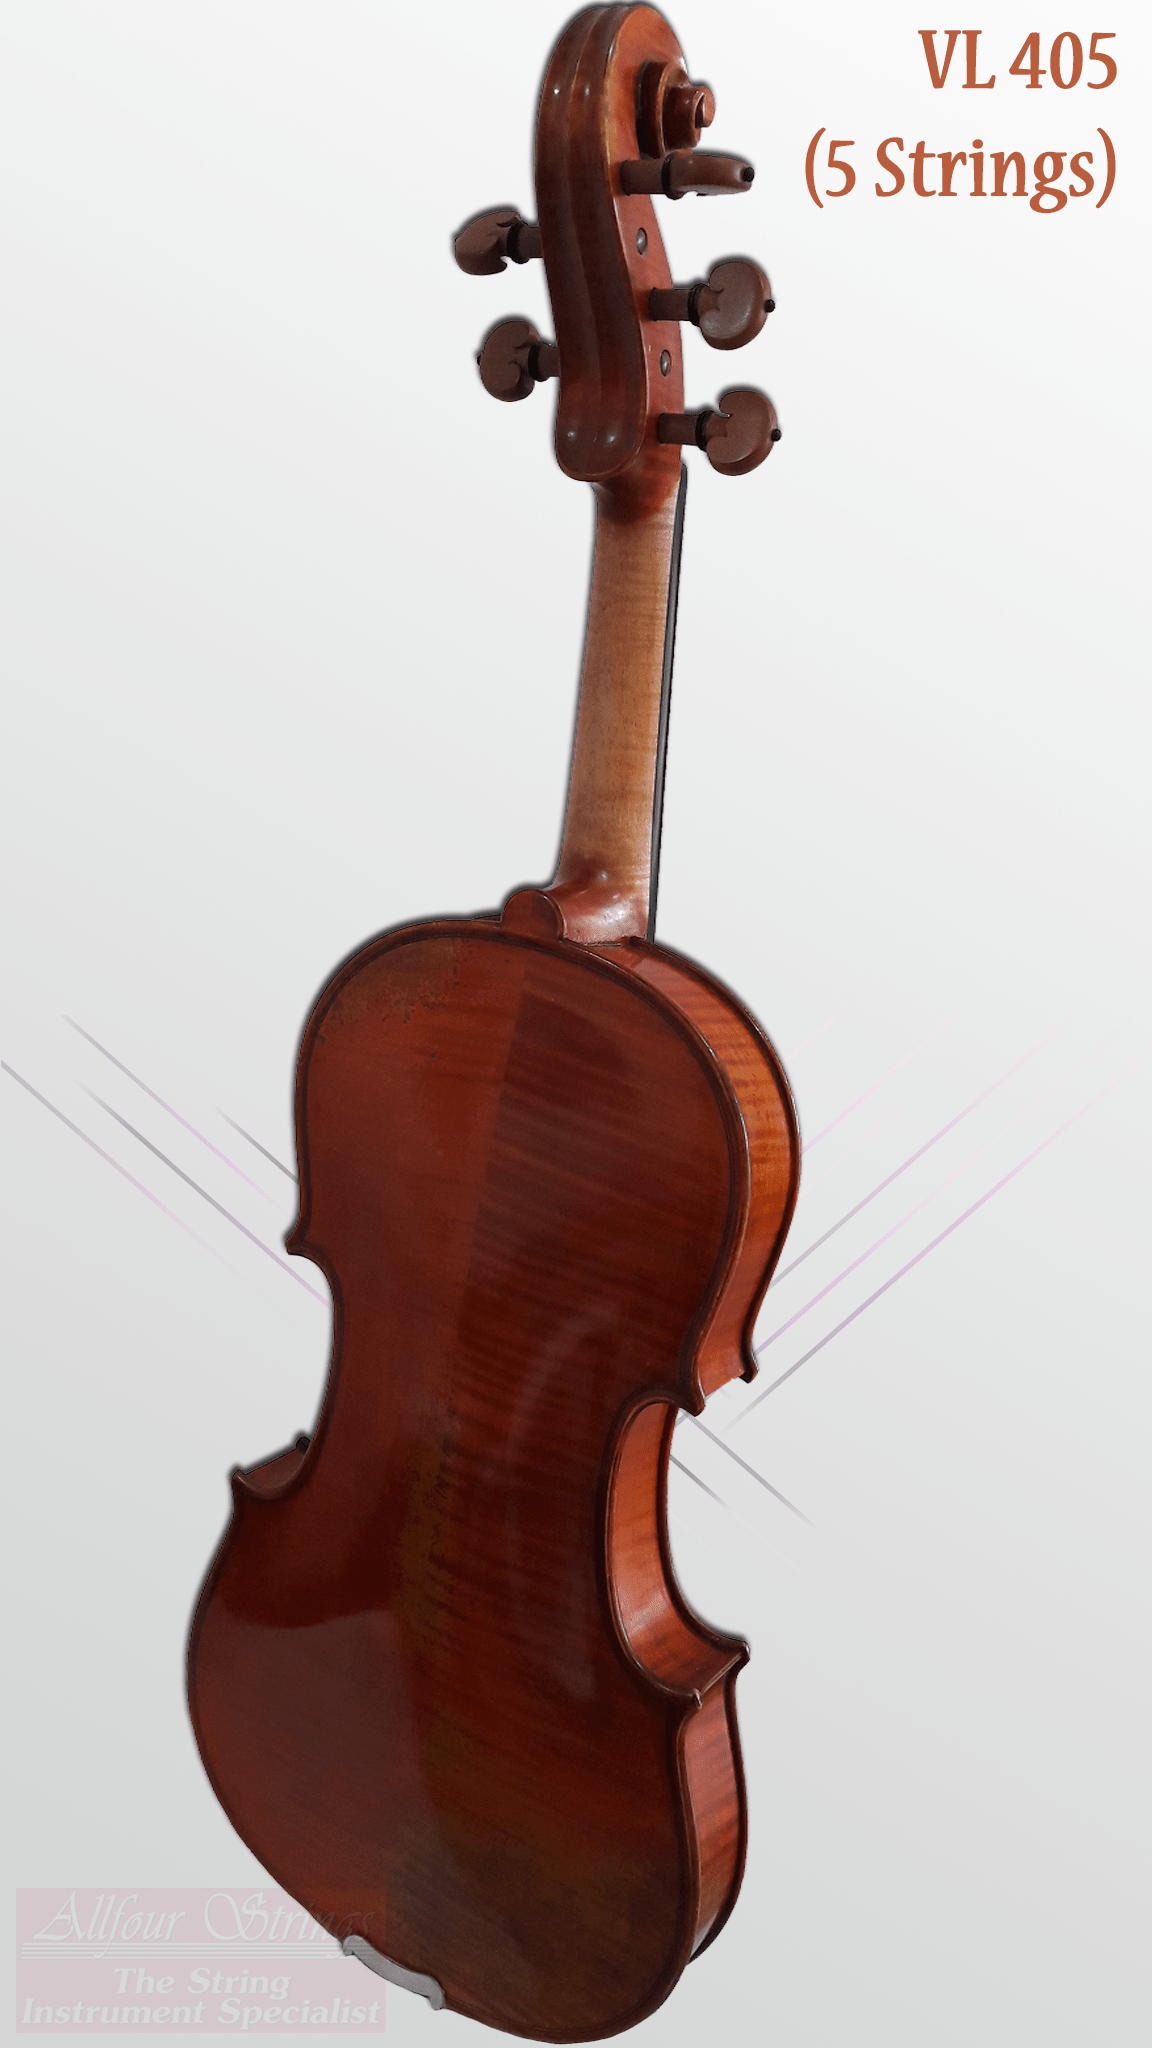 VL-405-5strings-Back-Right-min